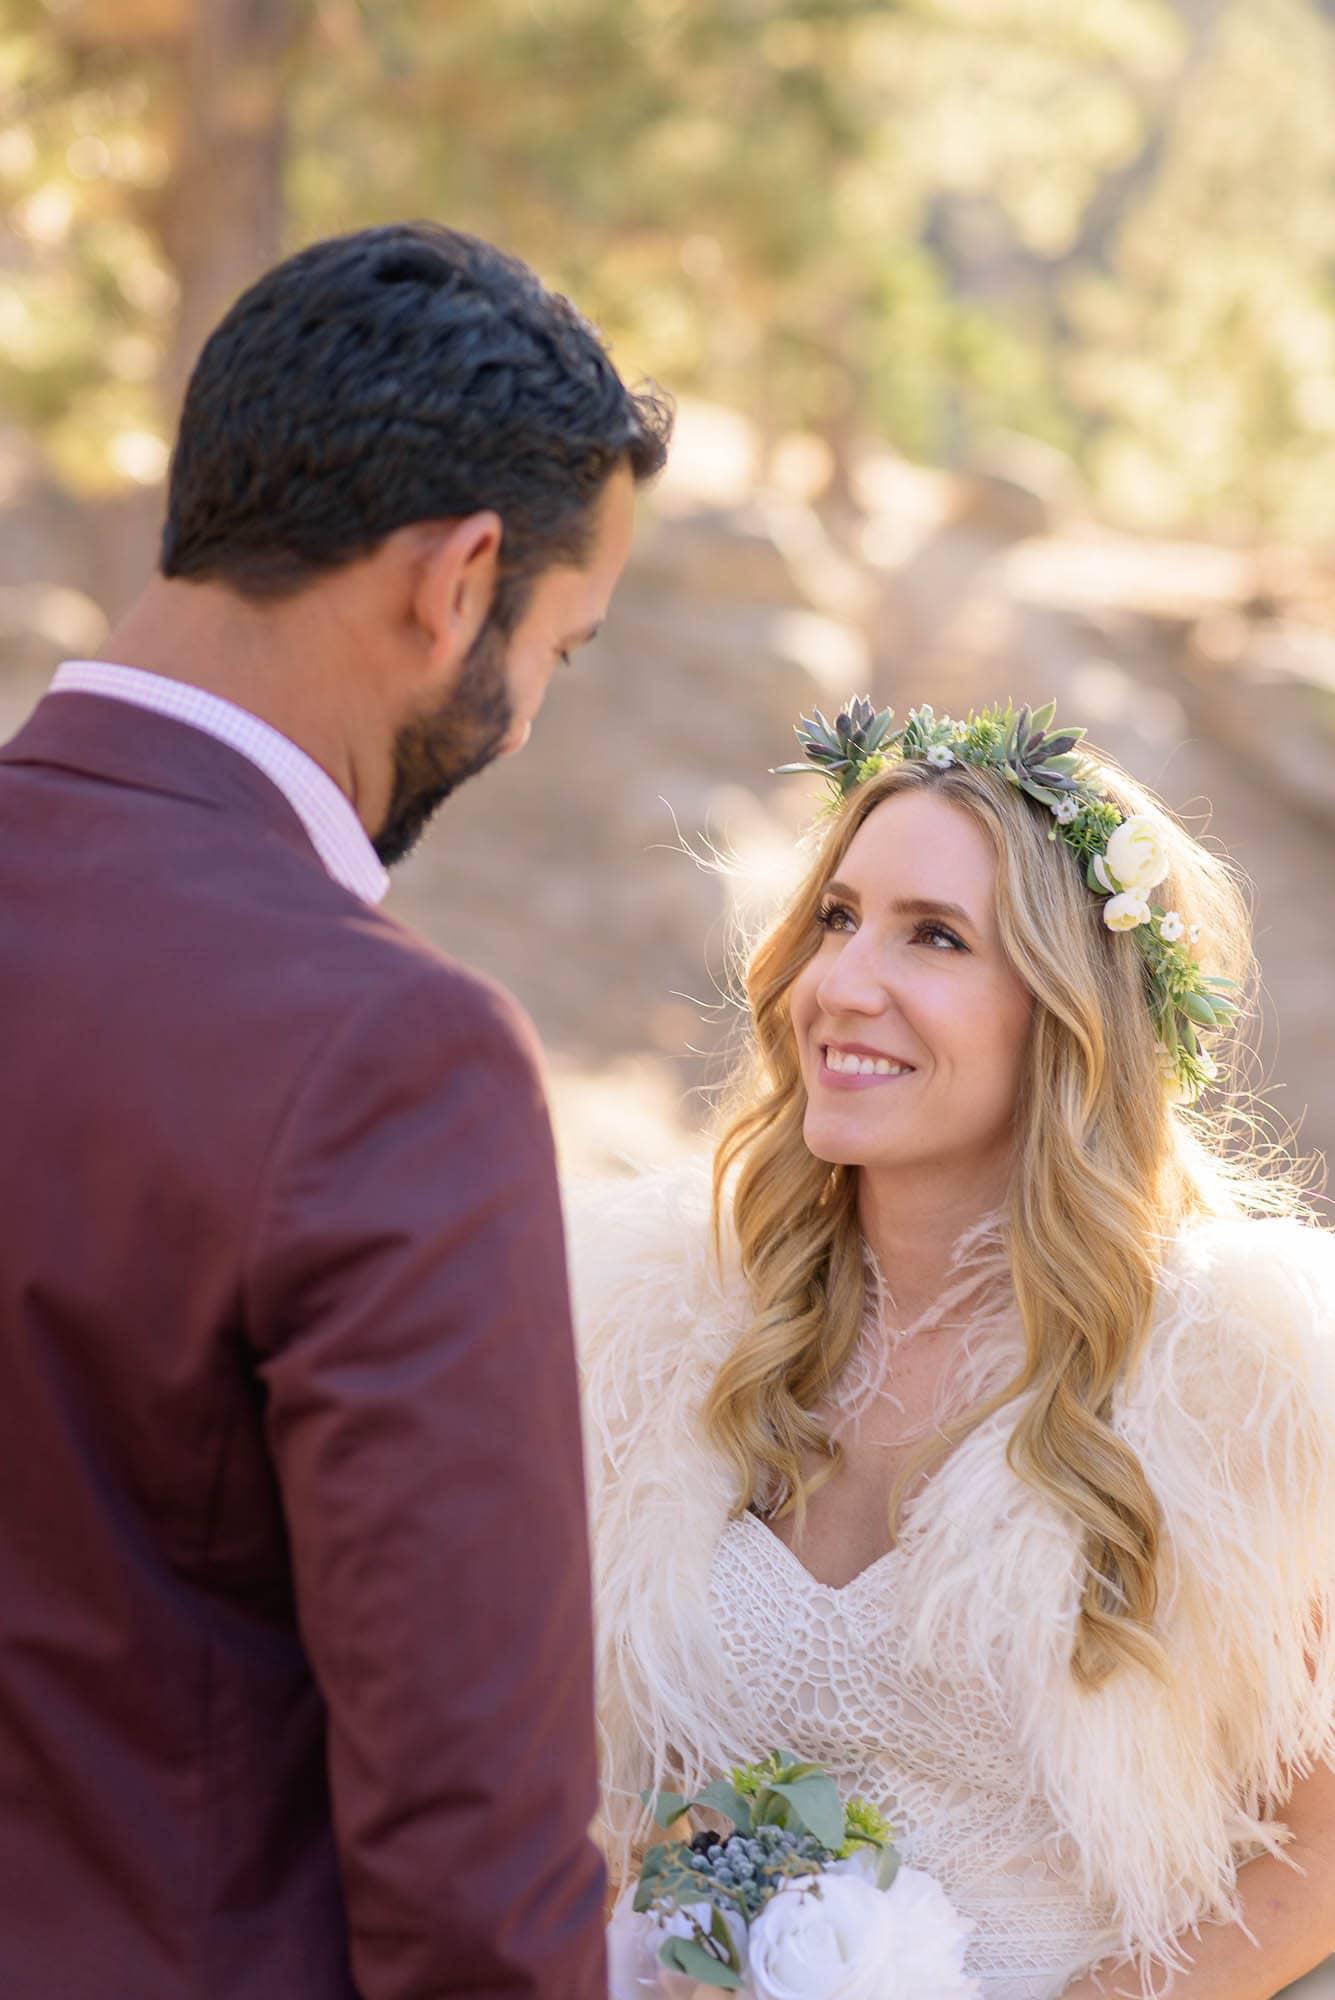 011_Alan_and_Heidi_Wedding_Natalie_Mike